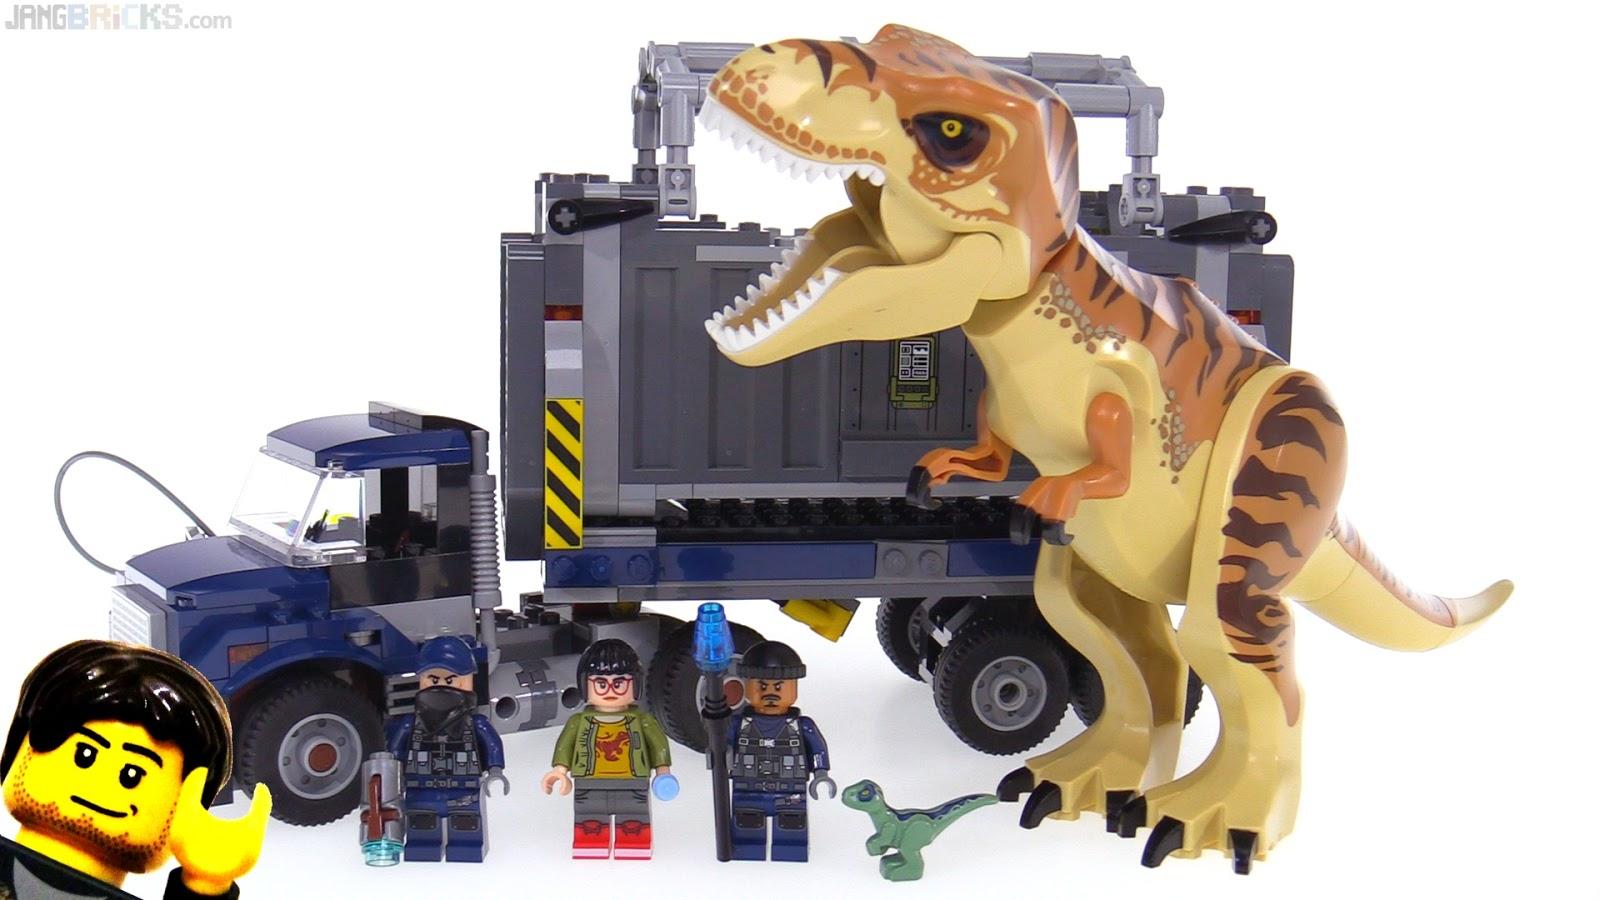 Lego Release 2018 >> Initial batch of LEGO Jurassic World: Fallen Kingdom set reviews